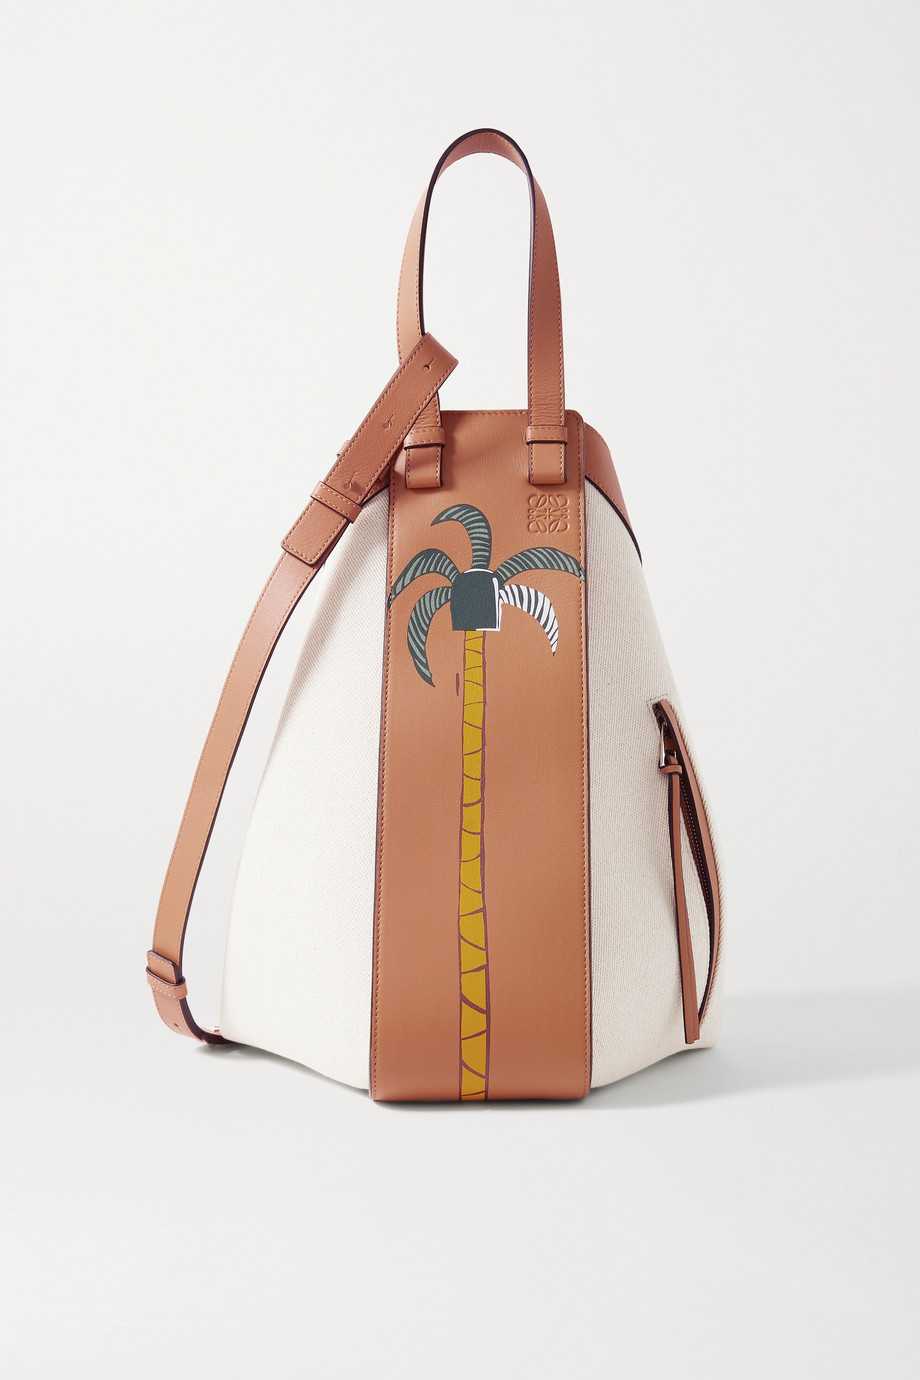 Loewe + Ken Price Hammock La Palme medium paneled leather and canvas tote